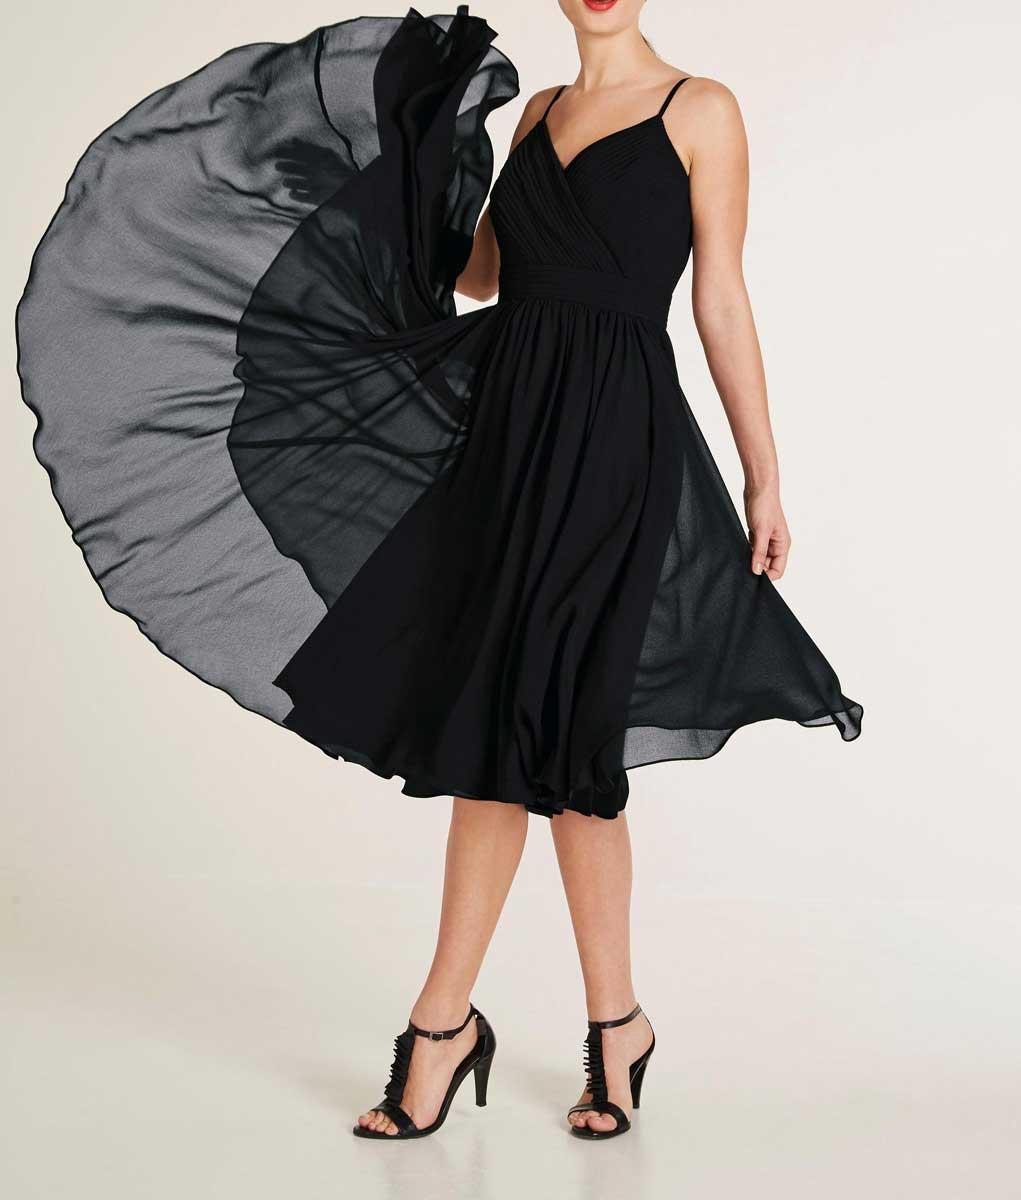 Ashley Brooke Abendkleid kurz, schwarz 770.685 Missforty.de